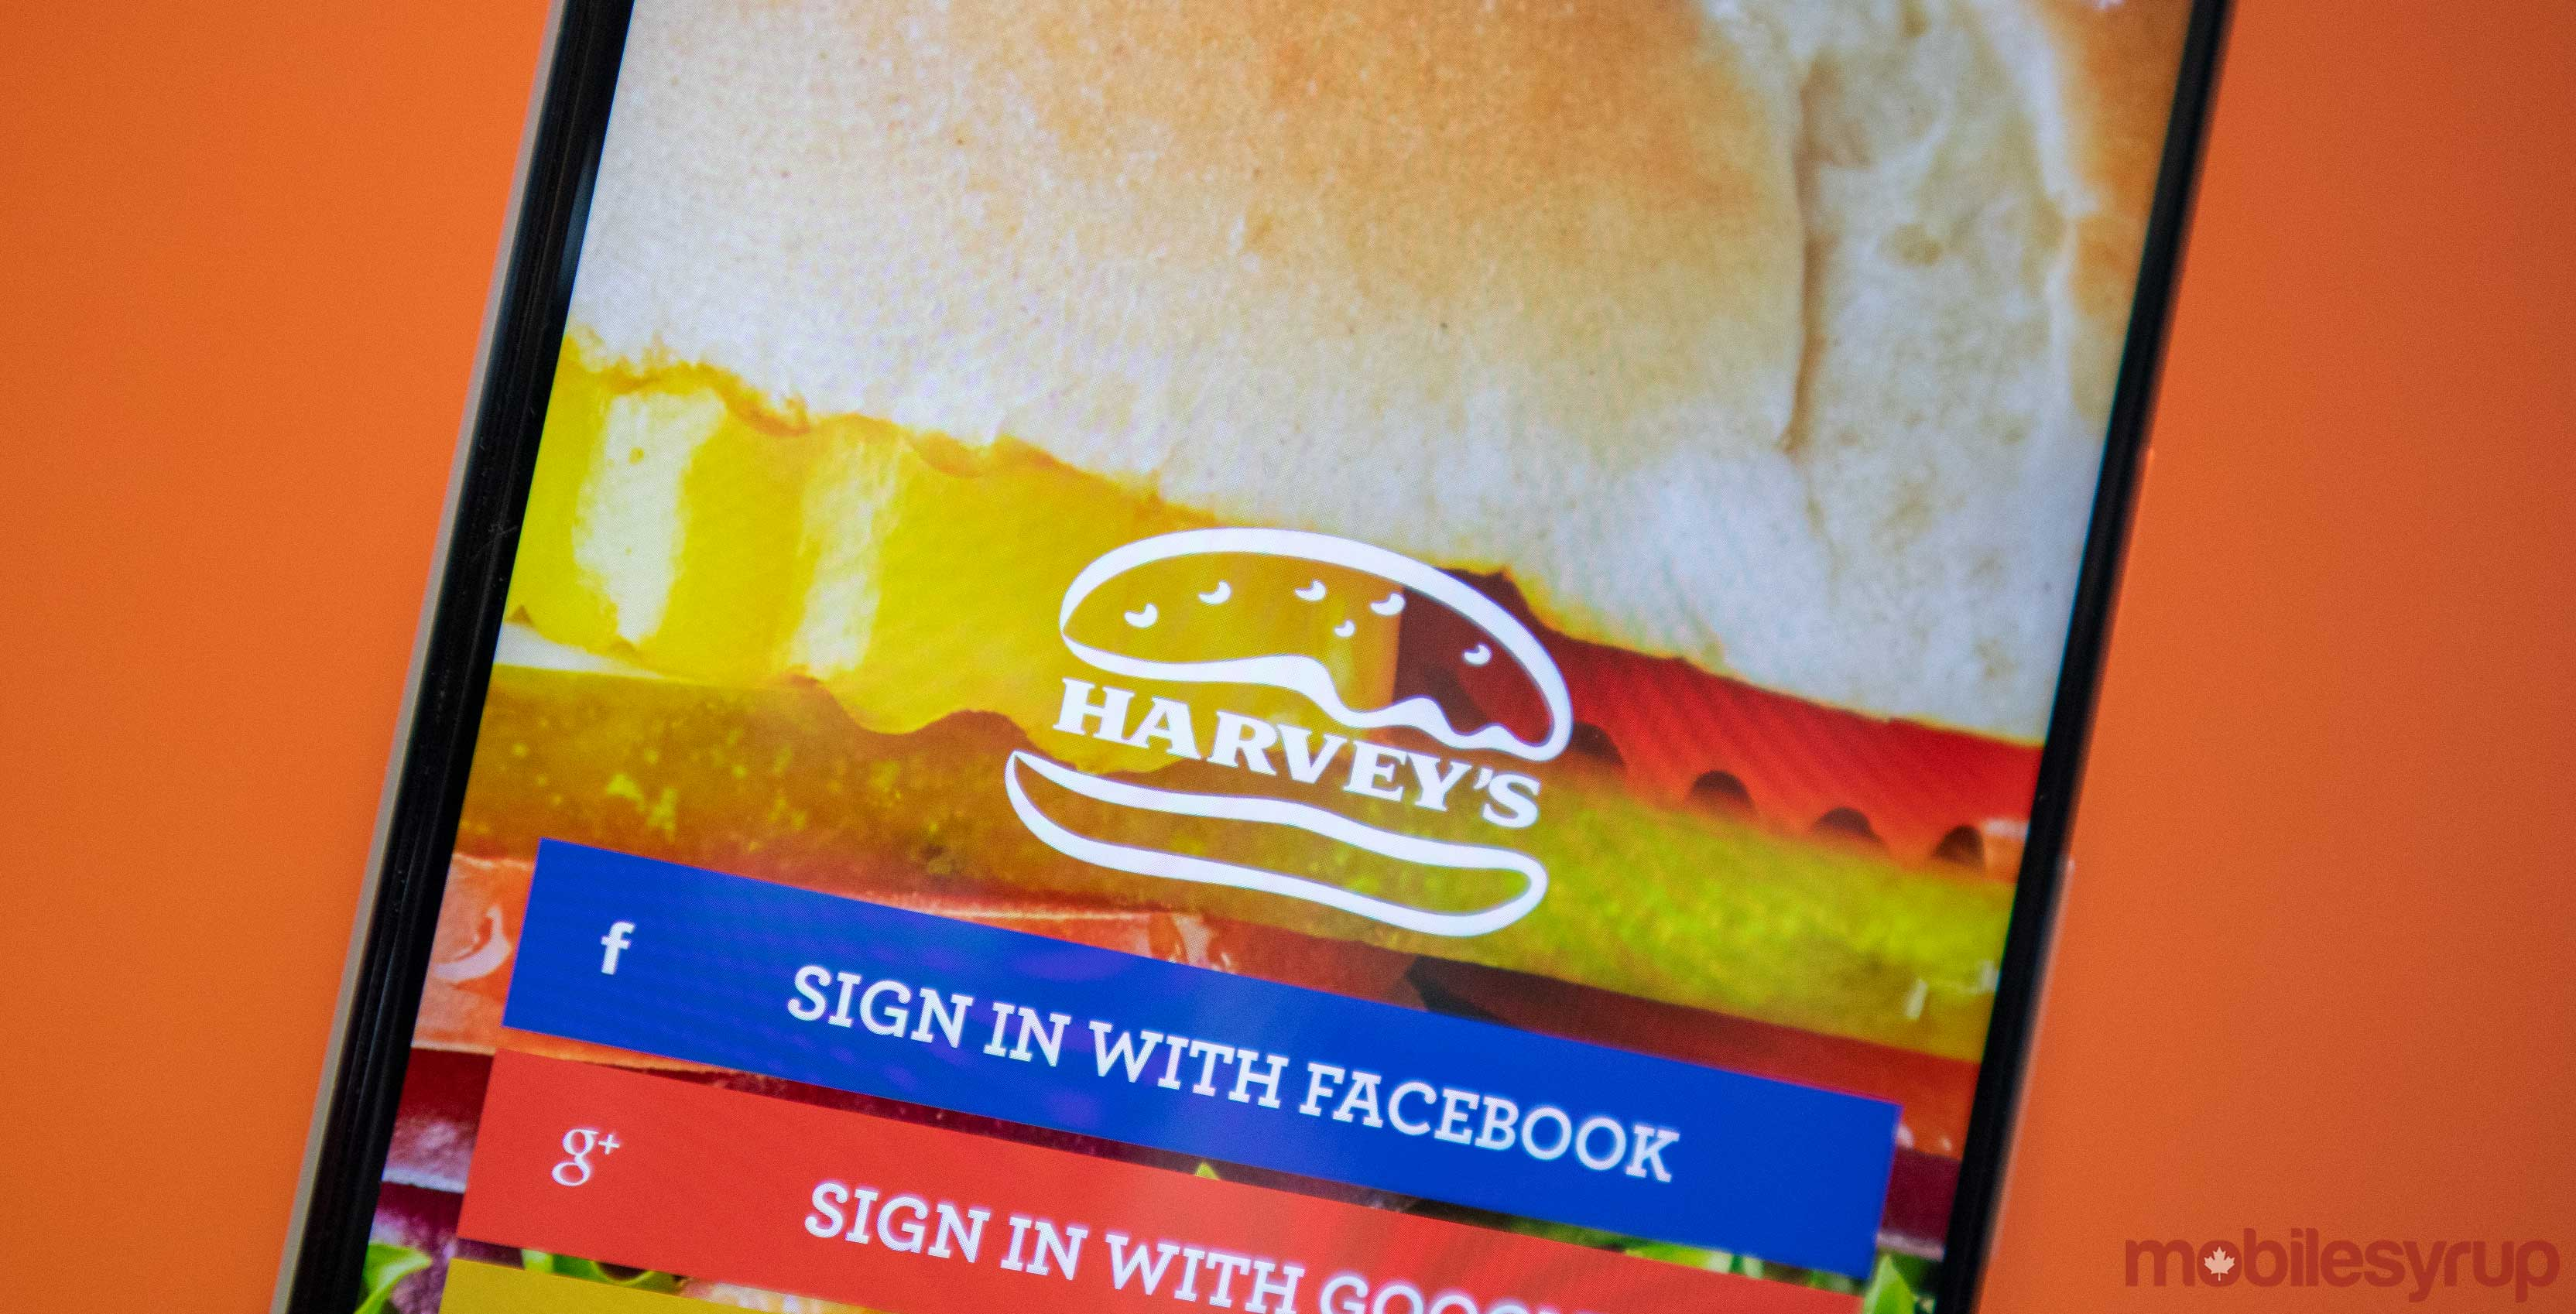 Harvey's celebrates Raptors, gives Canadians free burger through mobile app